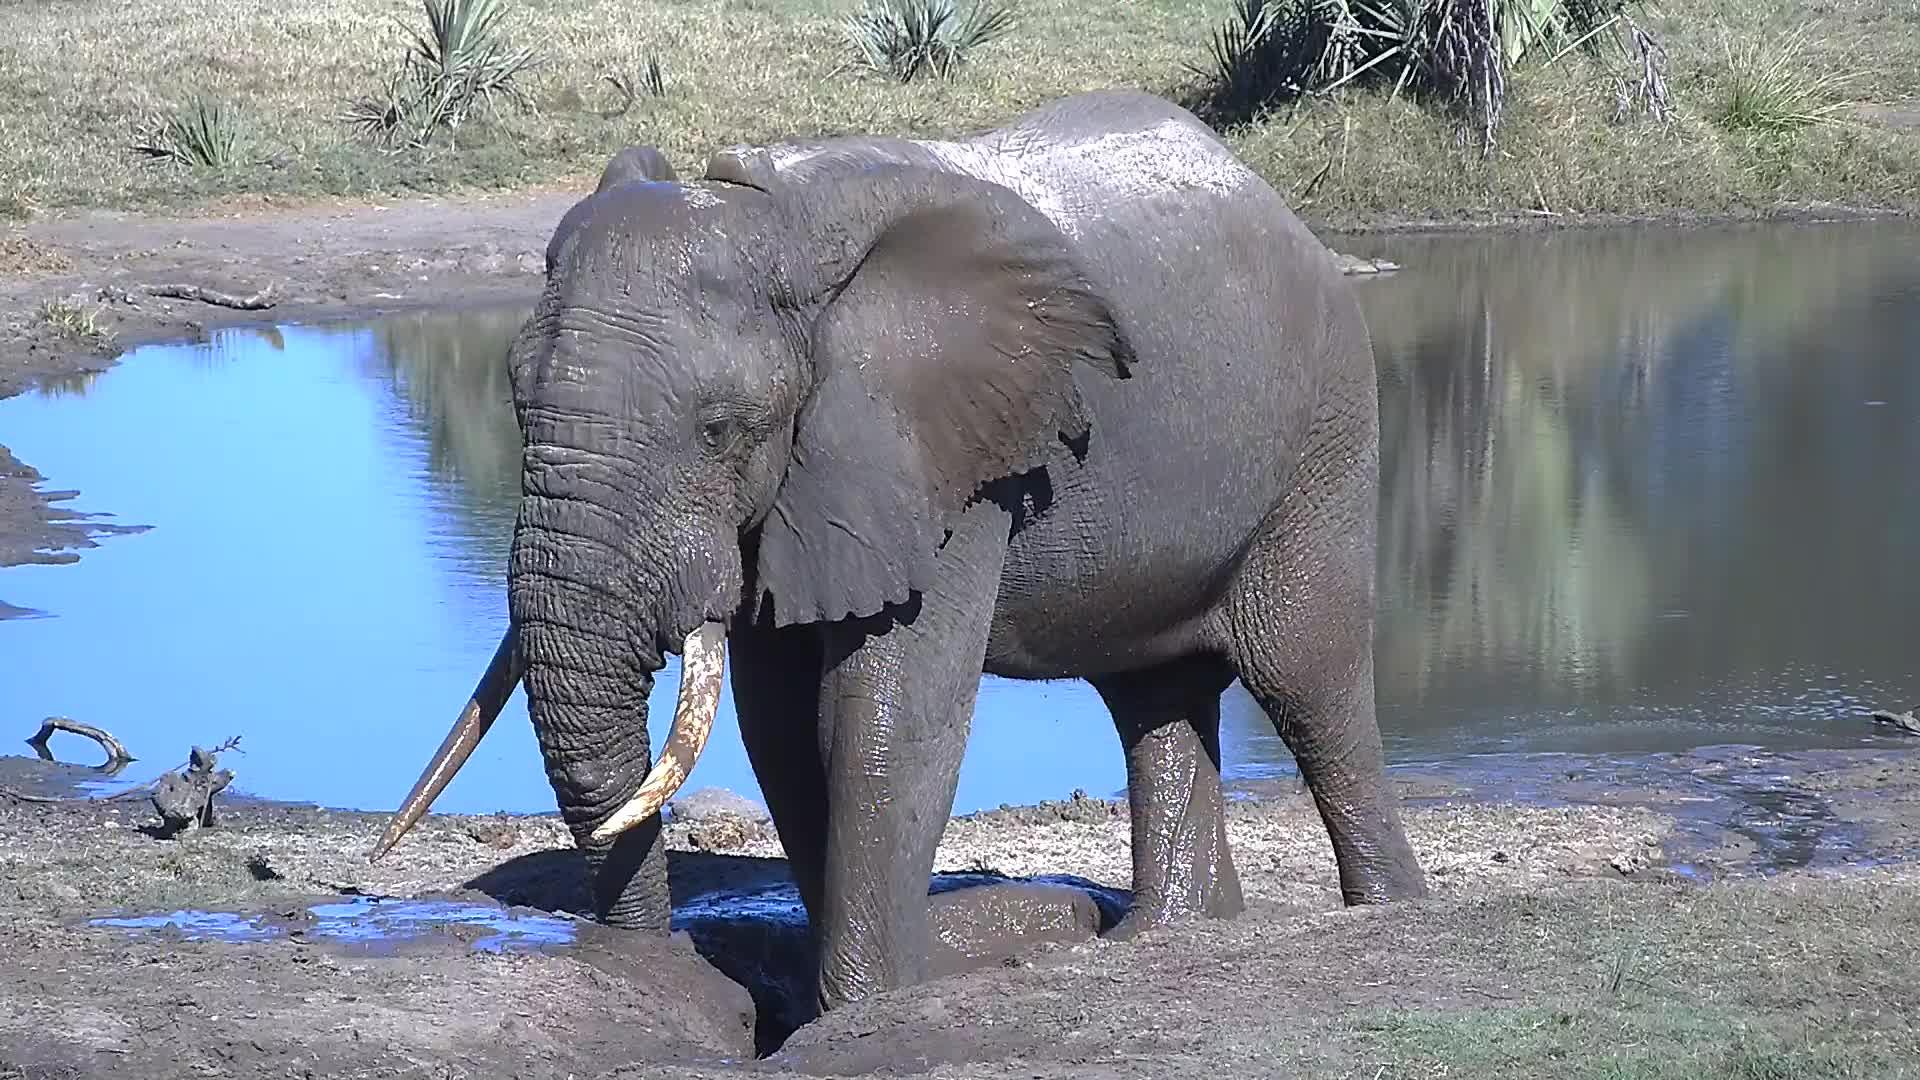 VIDEO: Elephant coating himself with mud